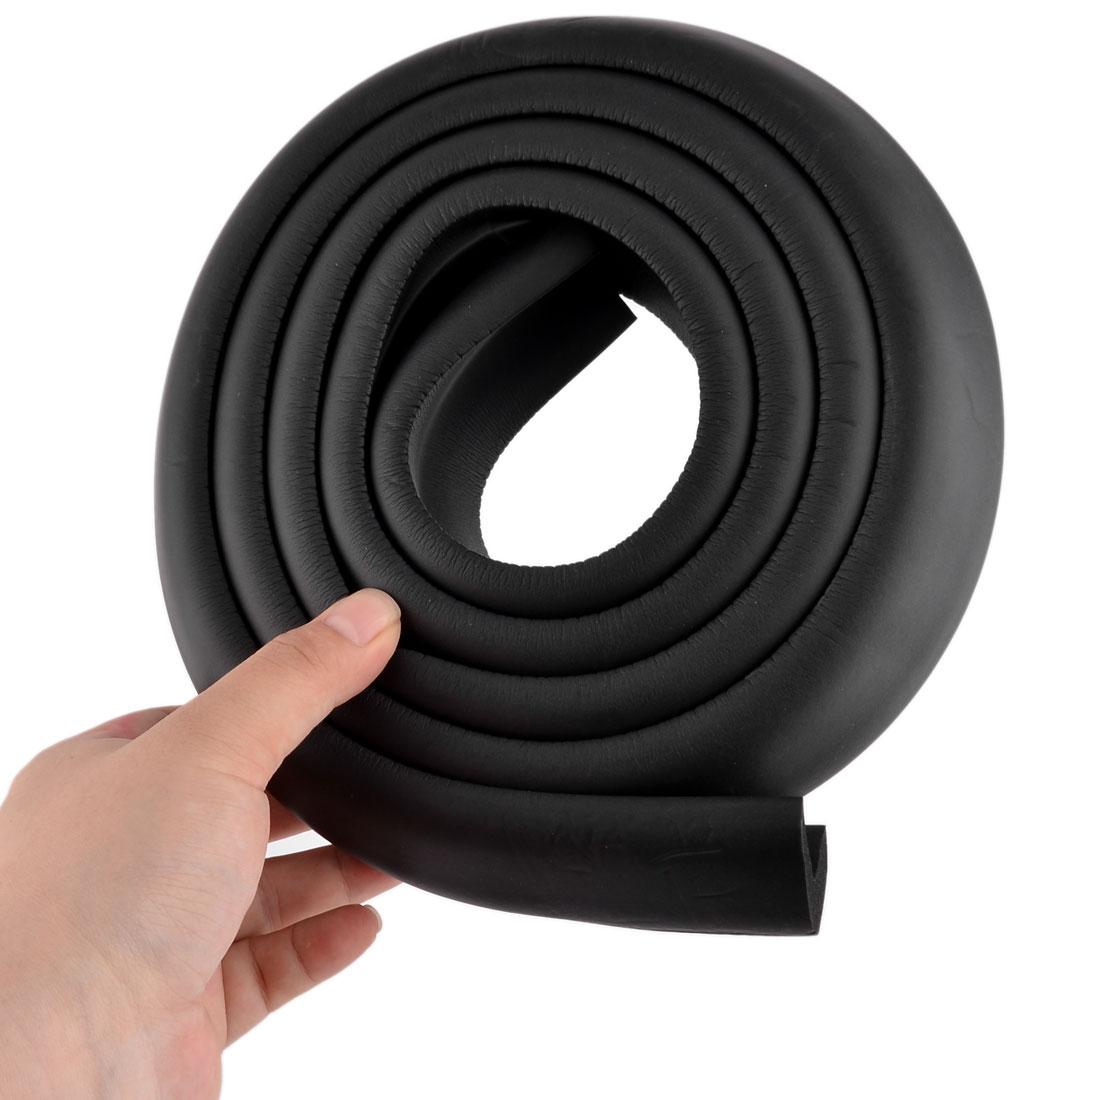 Furniture Dresser Foam Rubber Corner Edge Cover Protector Cushion Black 2pcs - image 3 de 5